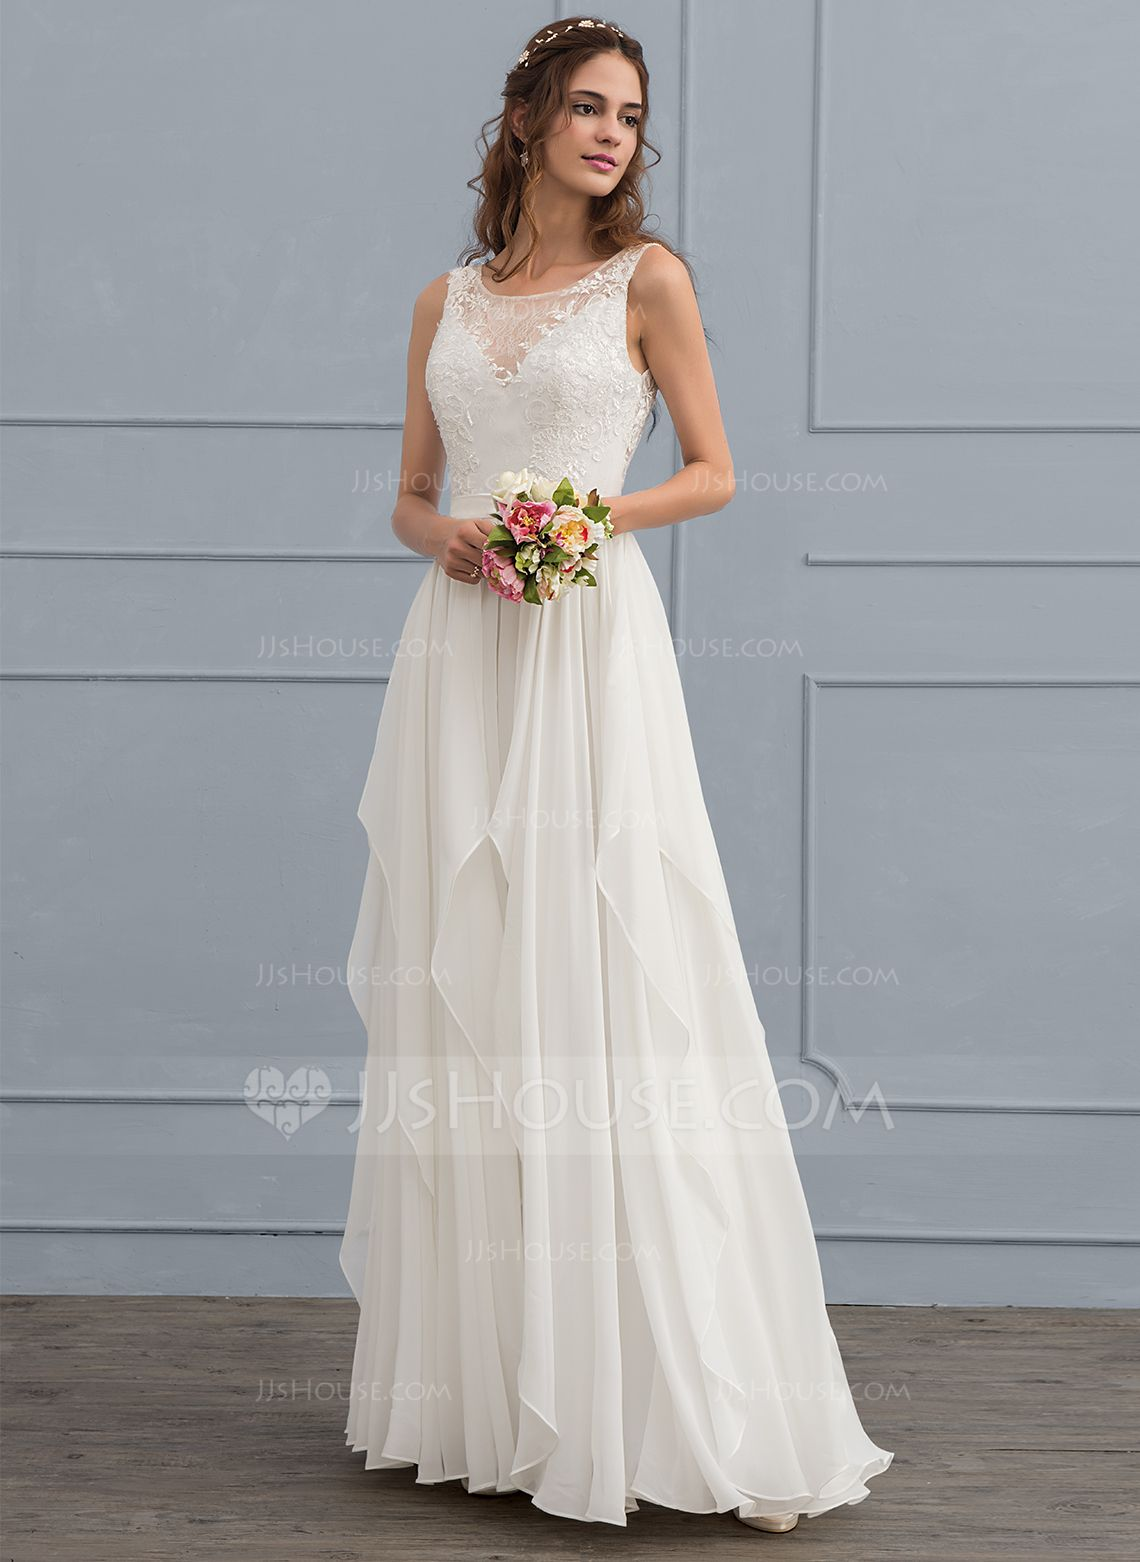 168 00 A Line Illusion Floor Length Chiffon Wedding Dress With Cascading Ruffles Jj S House Ruffle Wedding Dress Wedding Dress Patterns Wedding Dresses Plus Size [ 1562 x 1140 Pixel ]